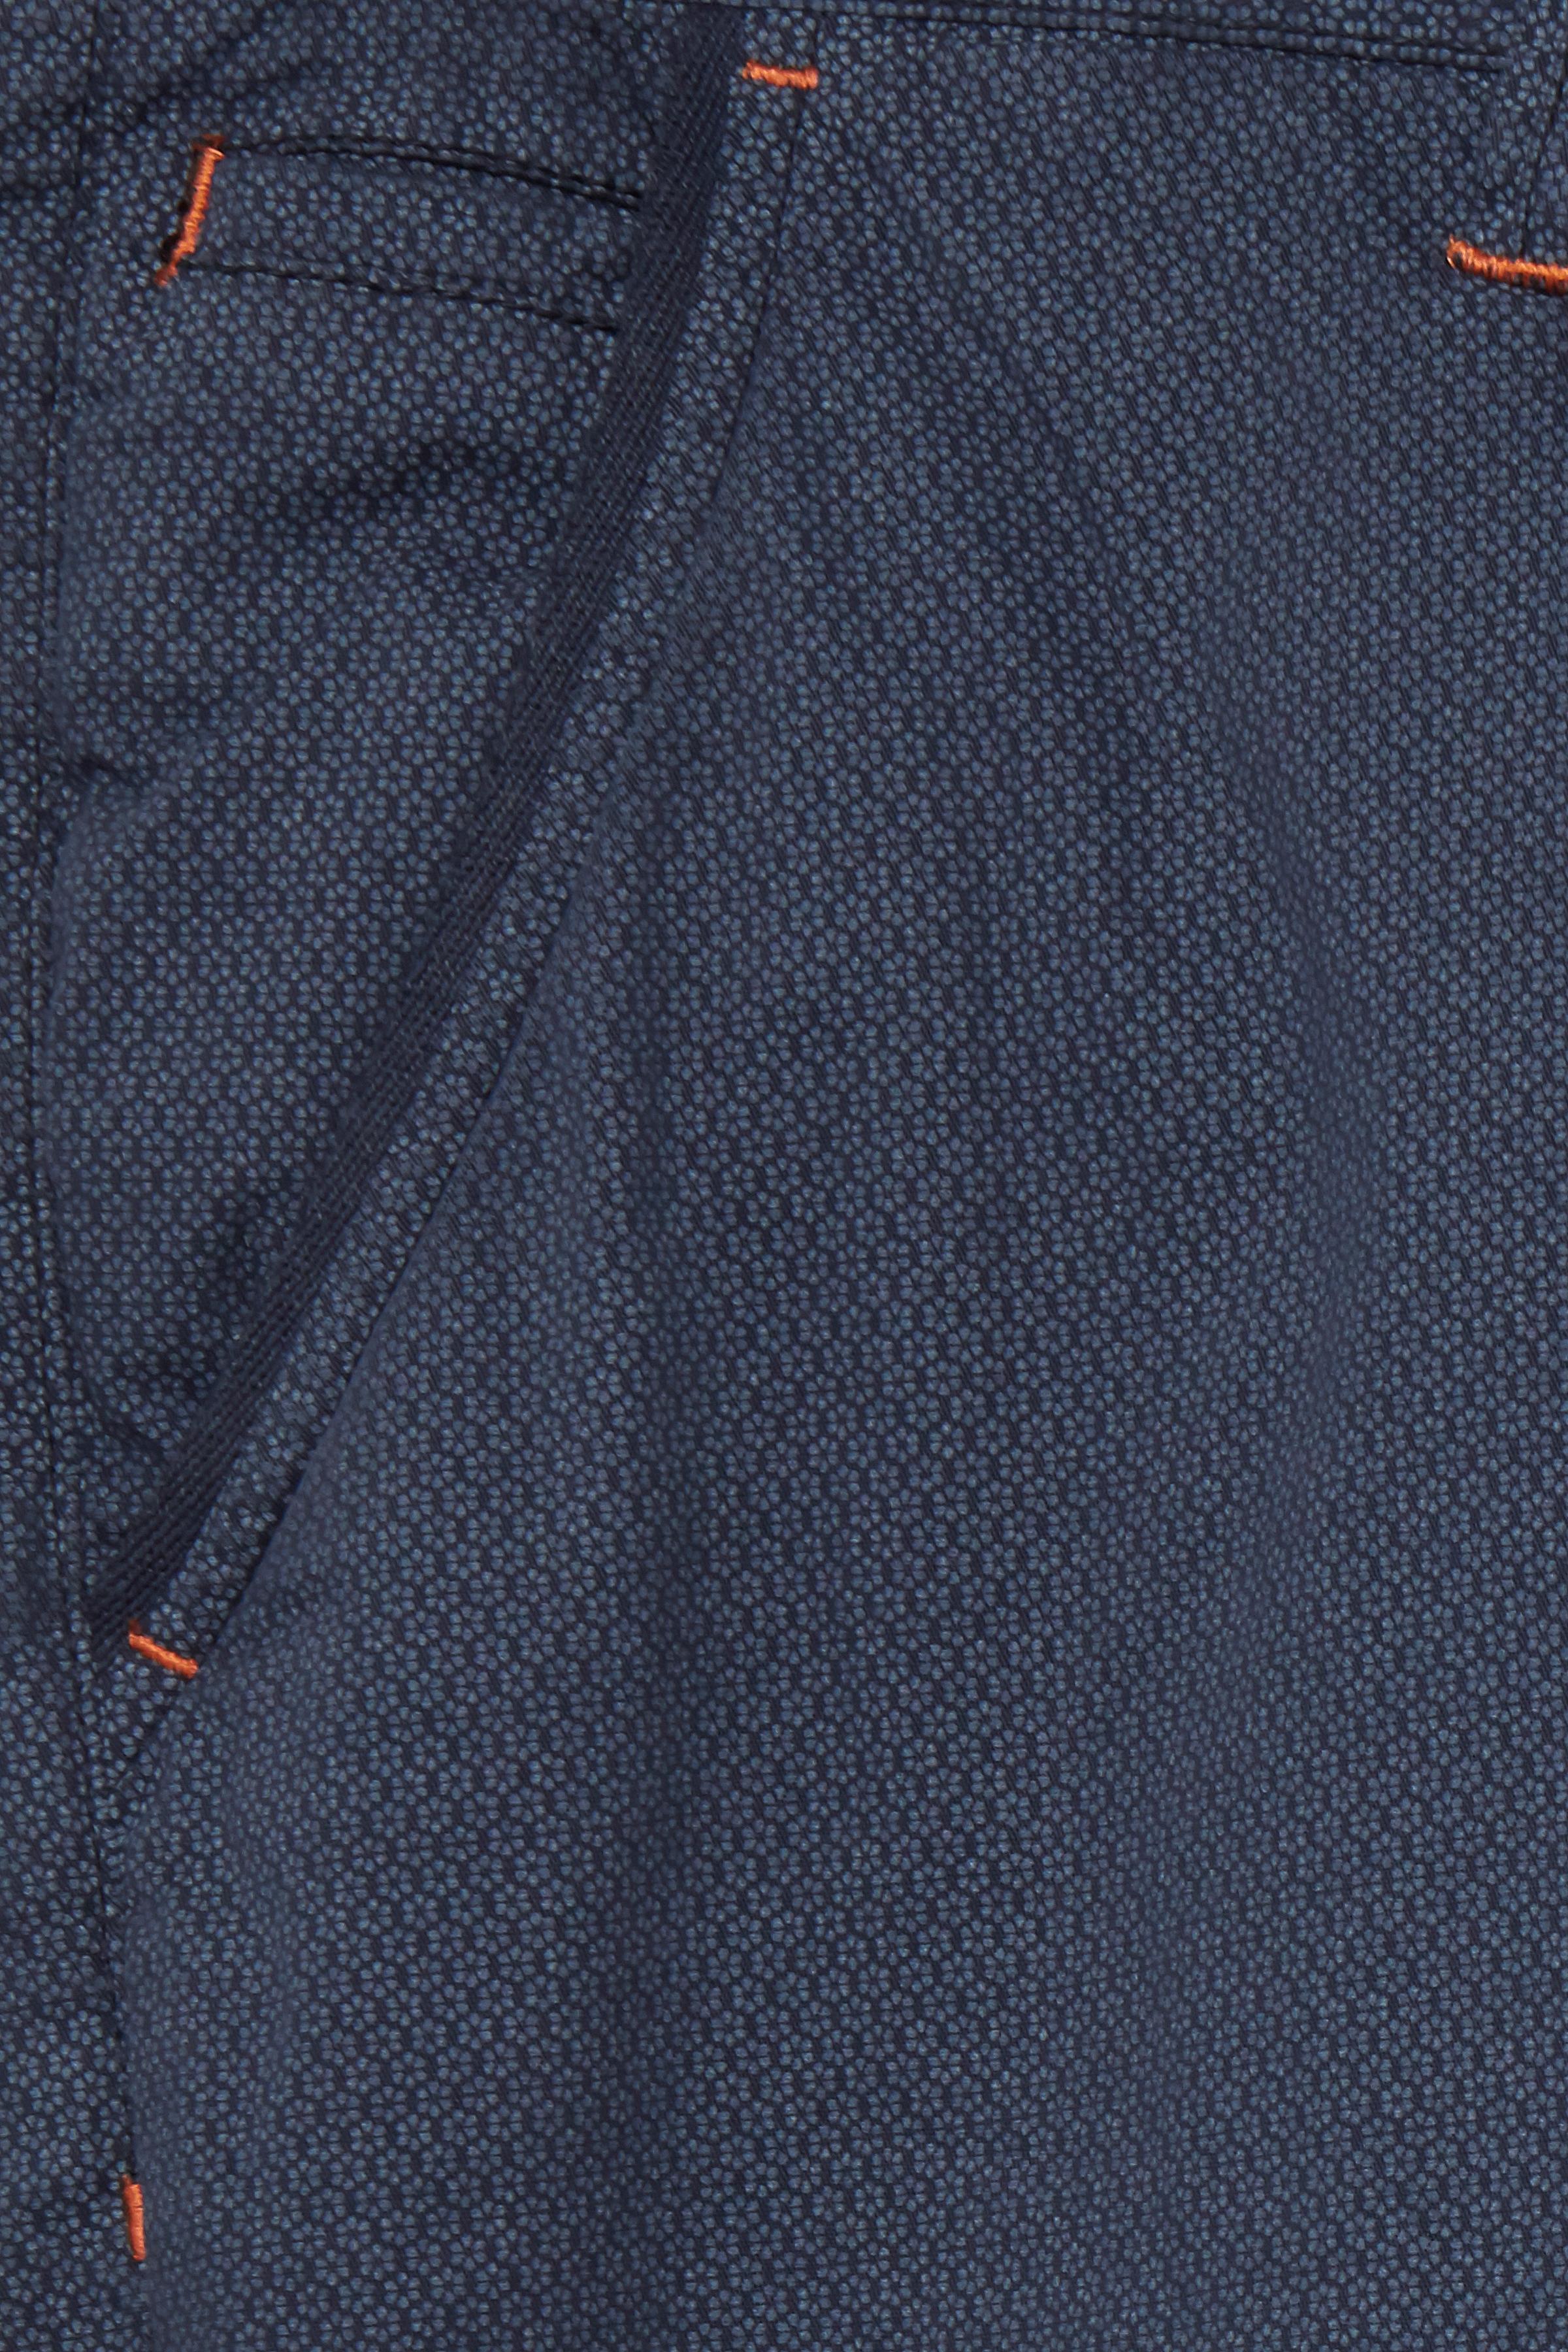 Dark Navy Blue Pants Casual – Køb Dark Navy Blue Pants Casual fra str. 28-38 her